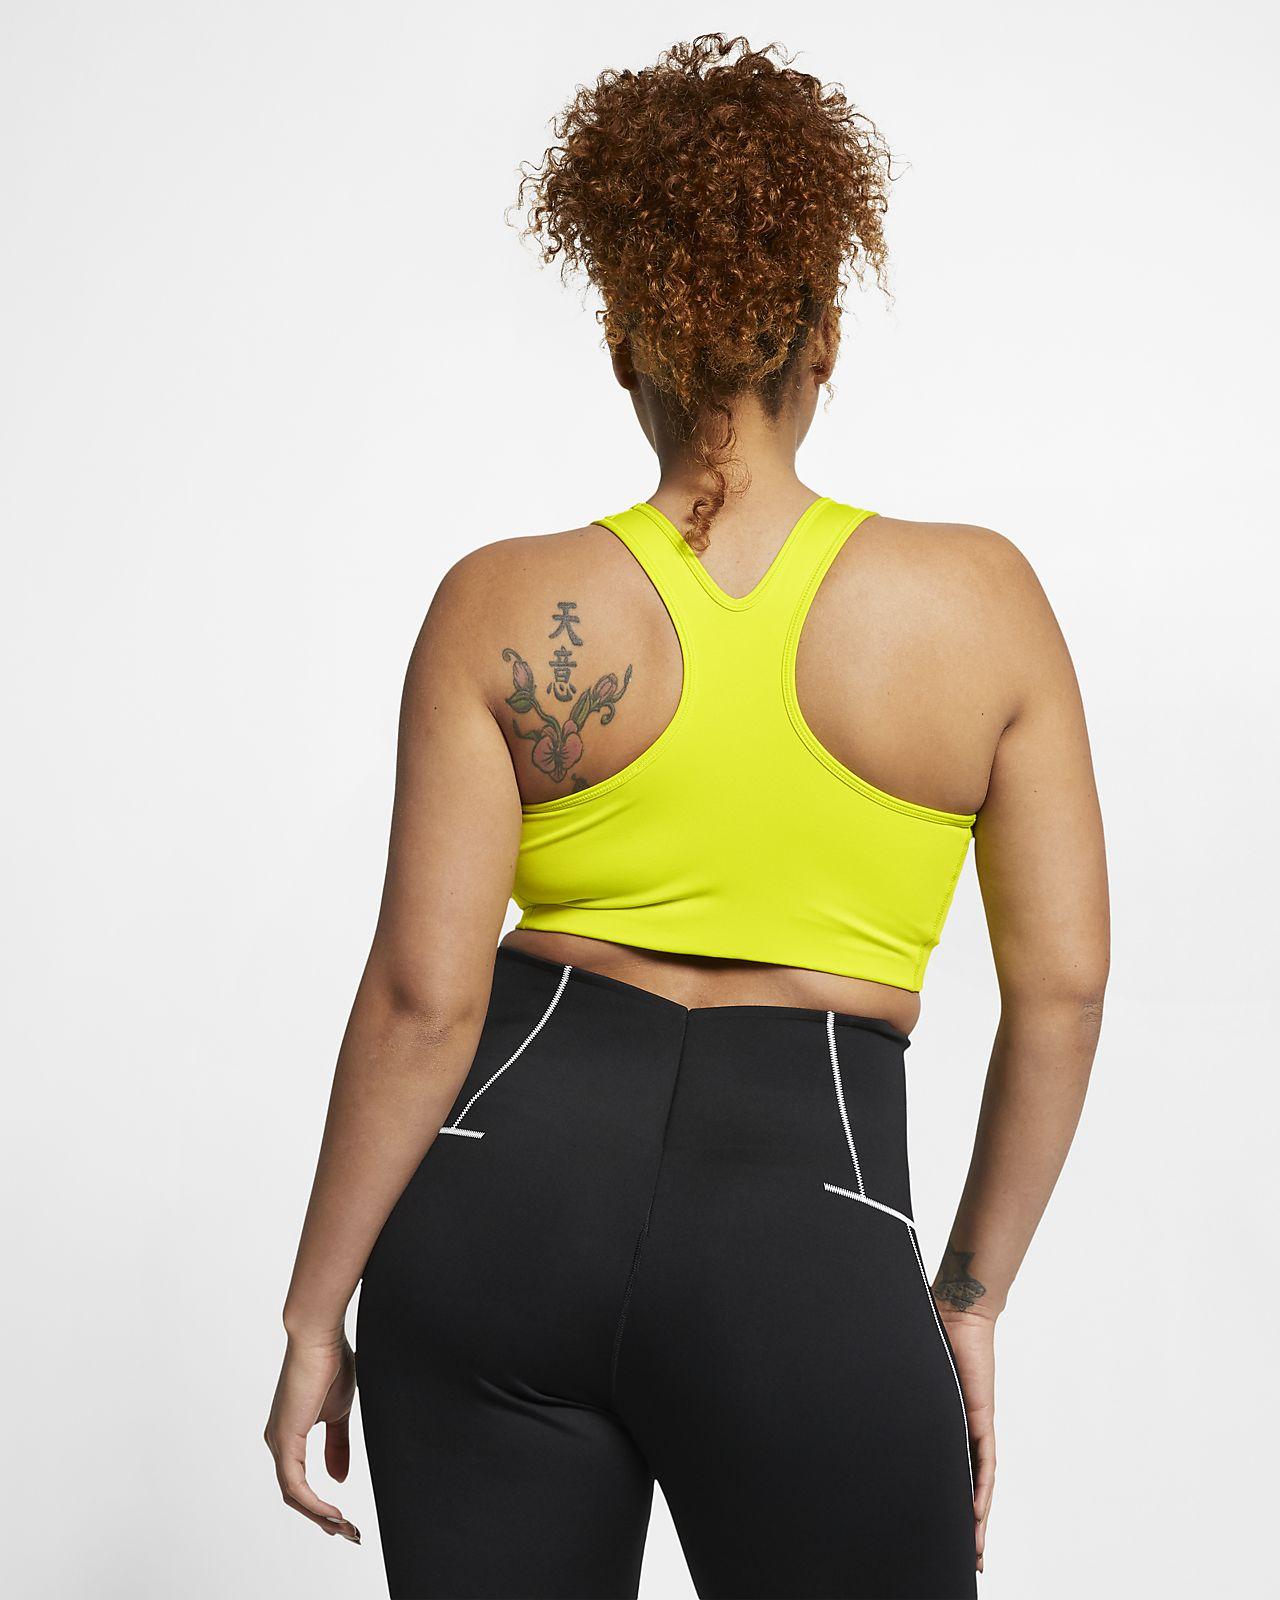 bfb652e2ce035 Nike Women's Swoosh Medium-Support Sports Bra (Plus Size). Nike.com